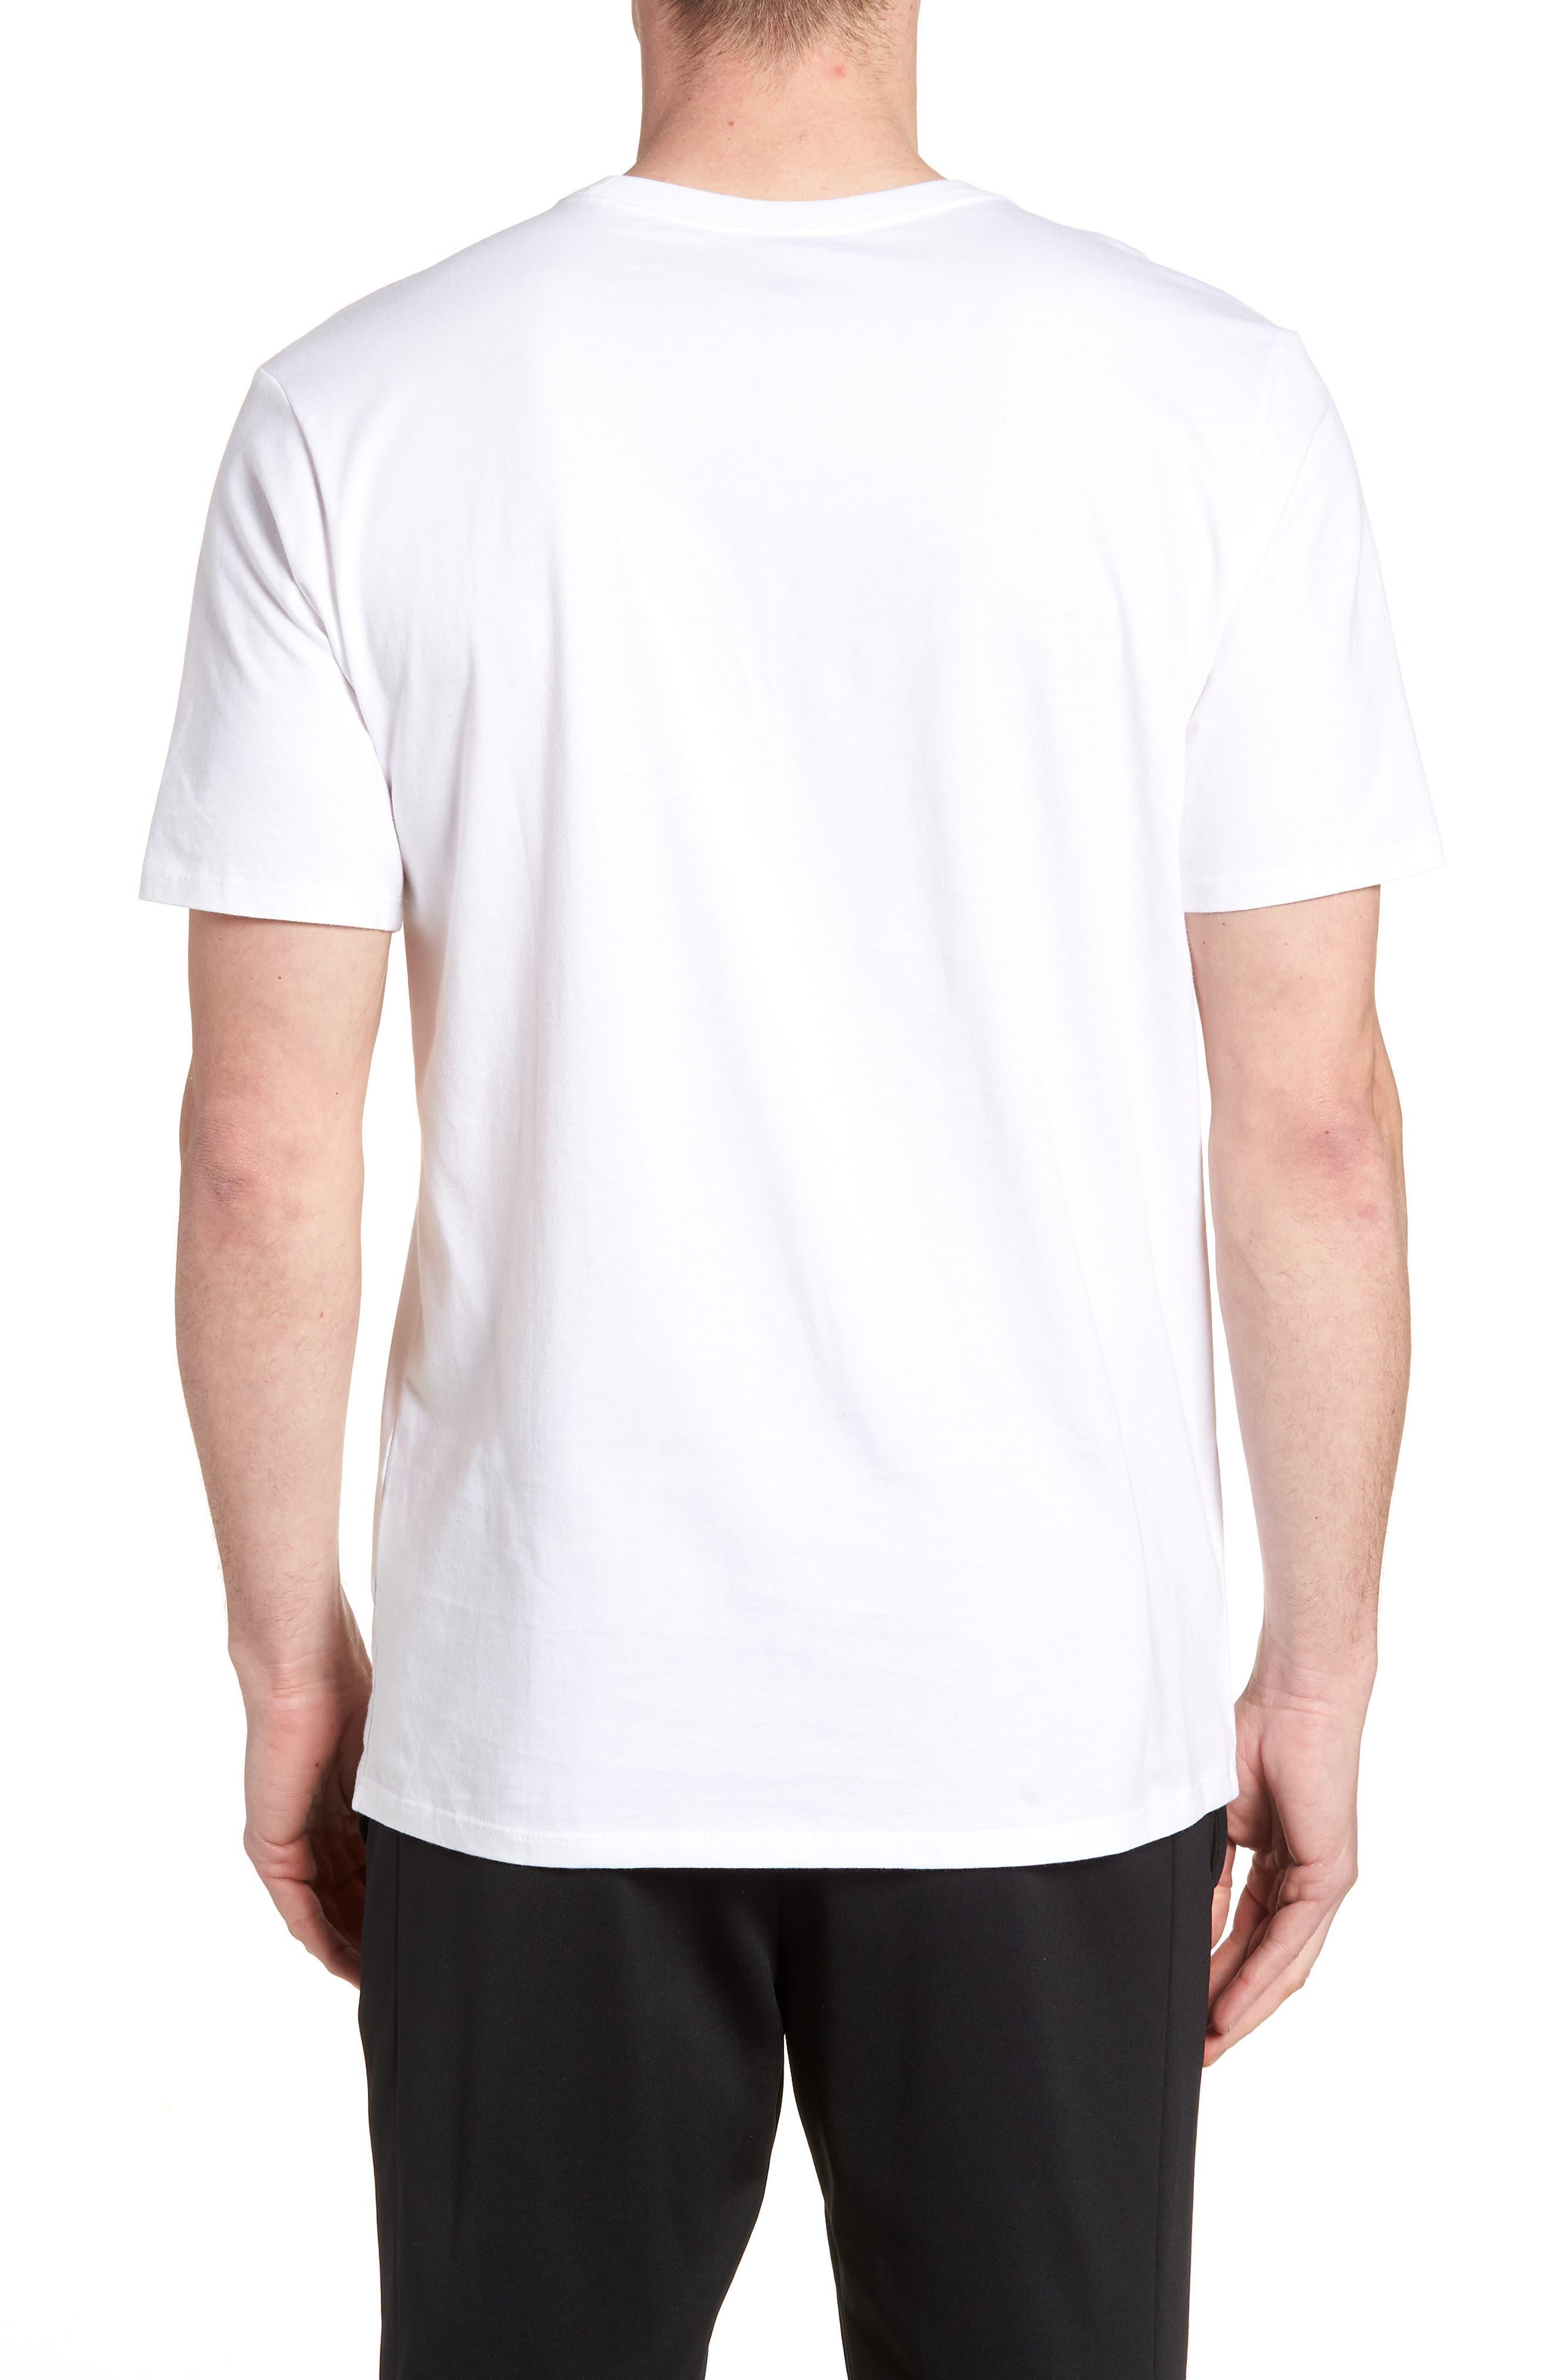 Sportswear City of Flight T-Shirt,                             Alternate thumbnail 6, color,